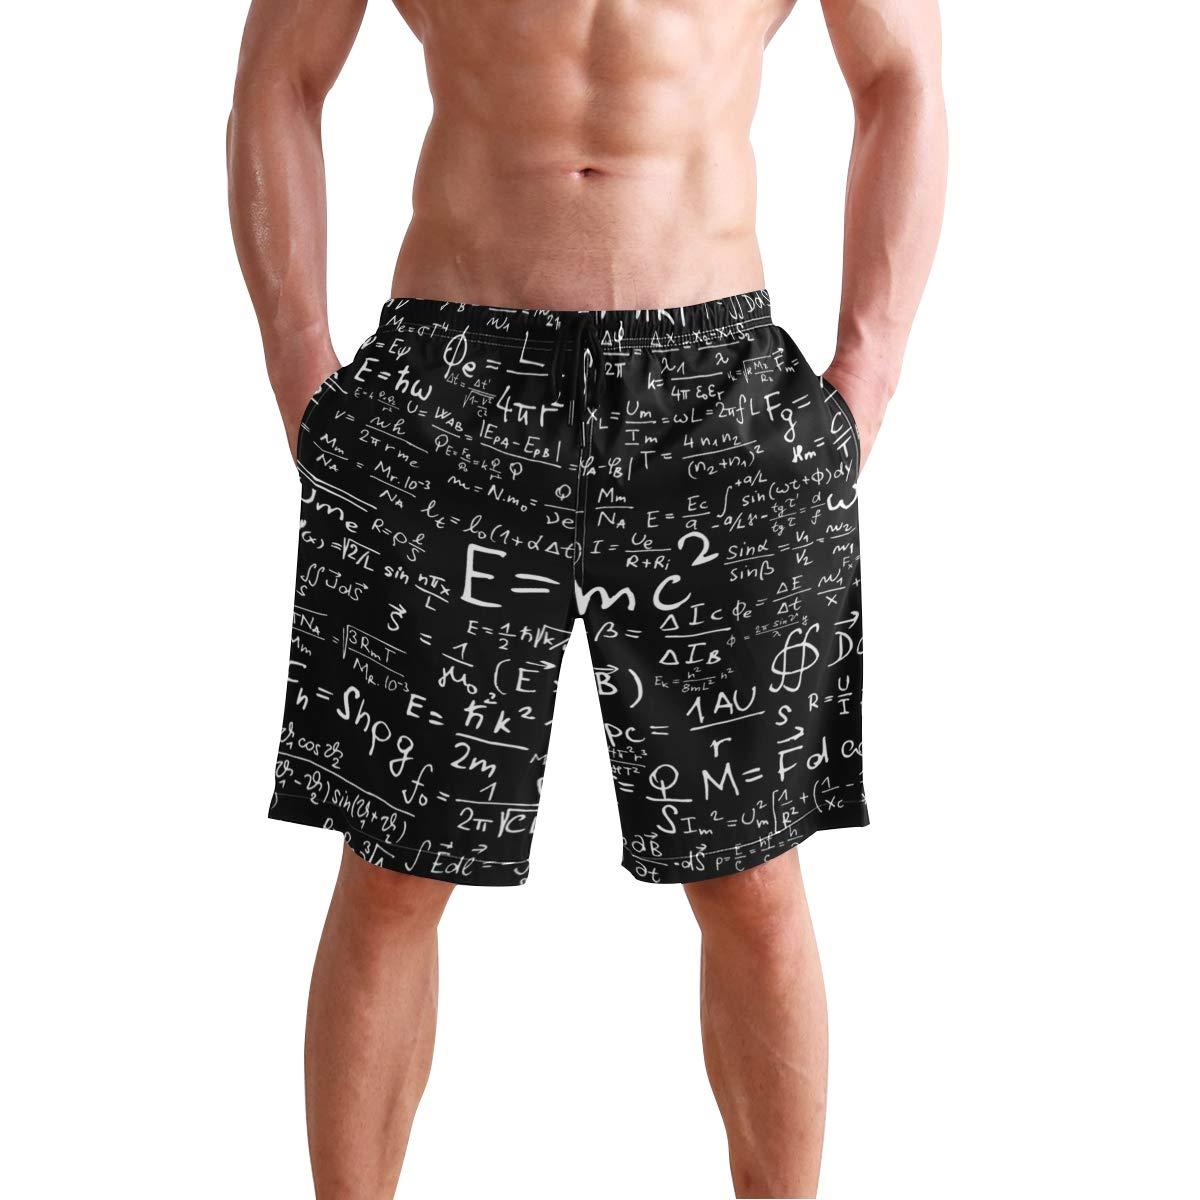 DongDongQiang Men Summer Physics Mathematics Equation Quick Dry Volleyball Beach Shorts Board Shorts